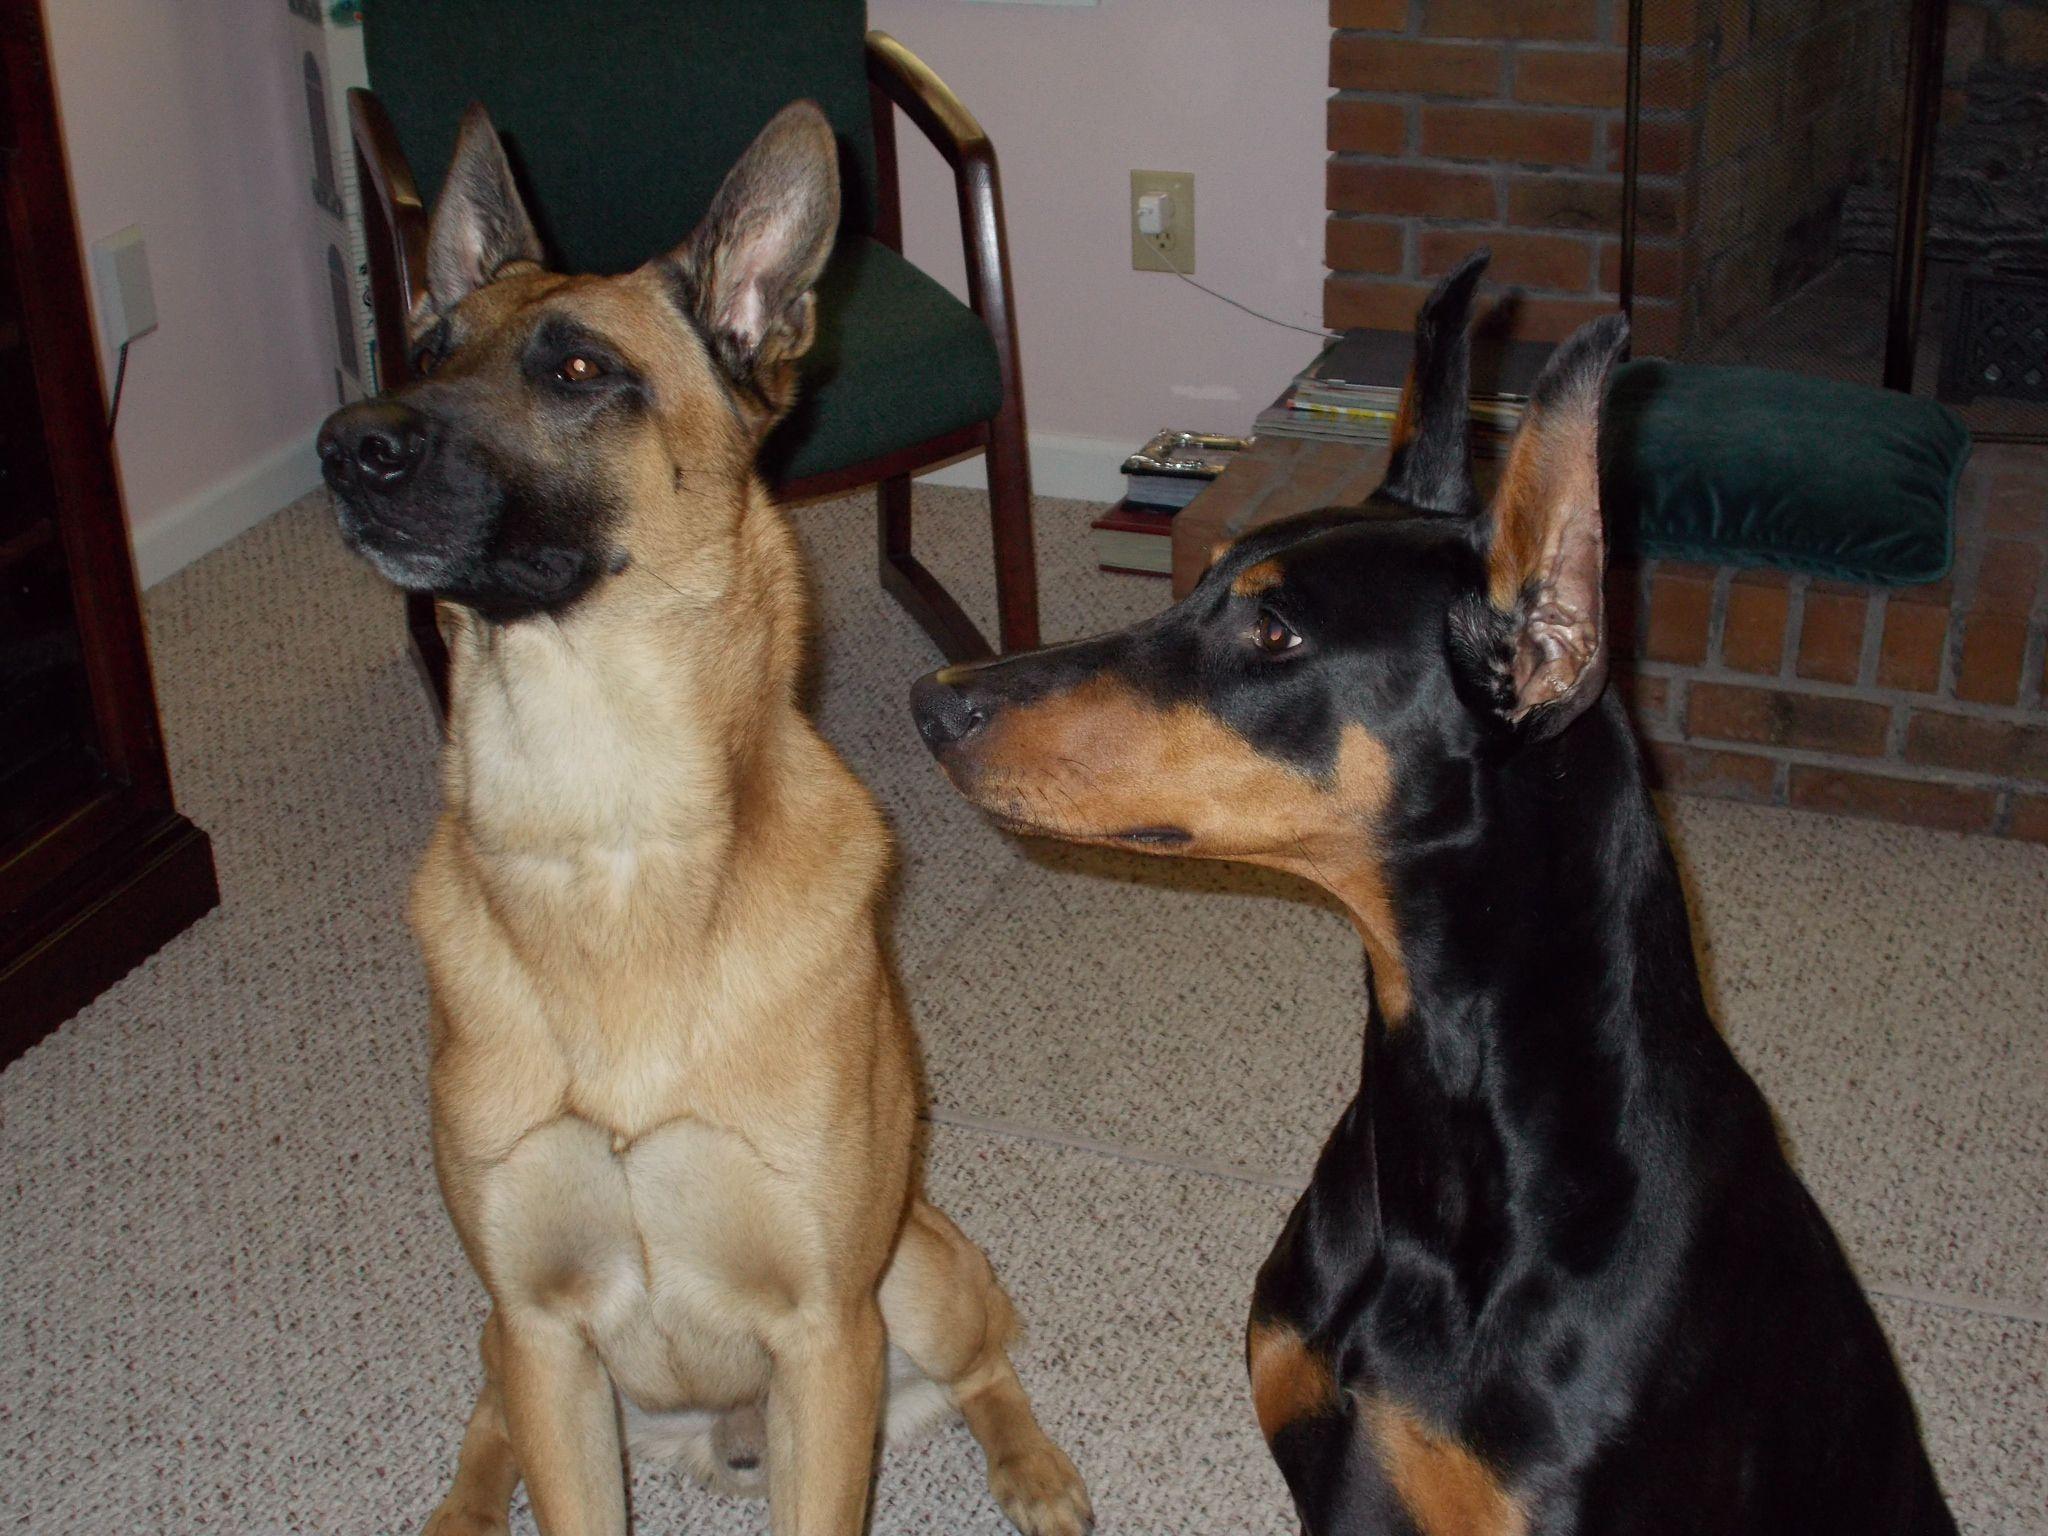 My Next 2 Dogs I Want..Belgium Malinois And Doberman